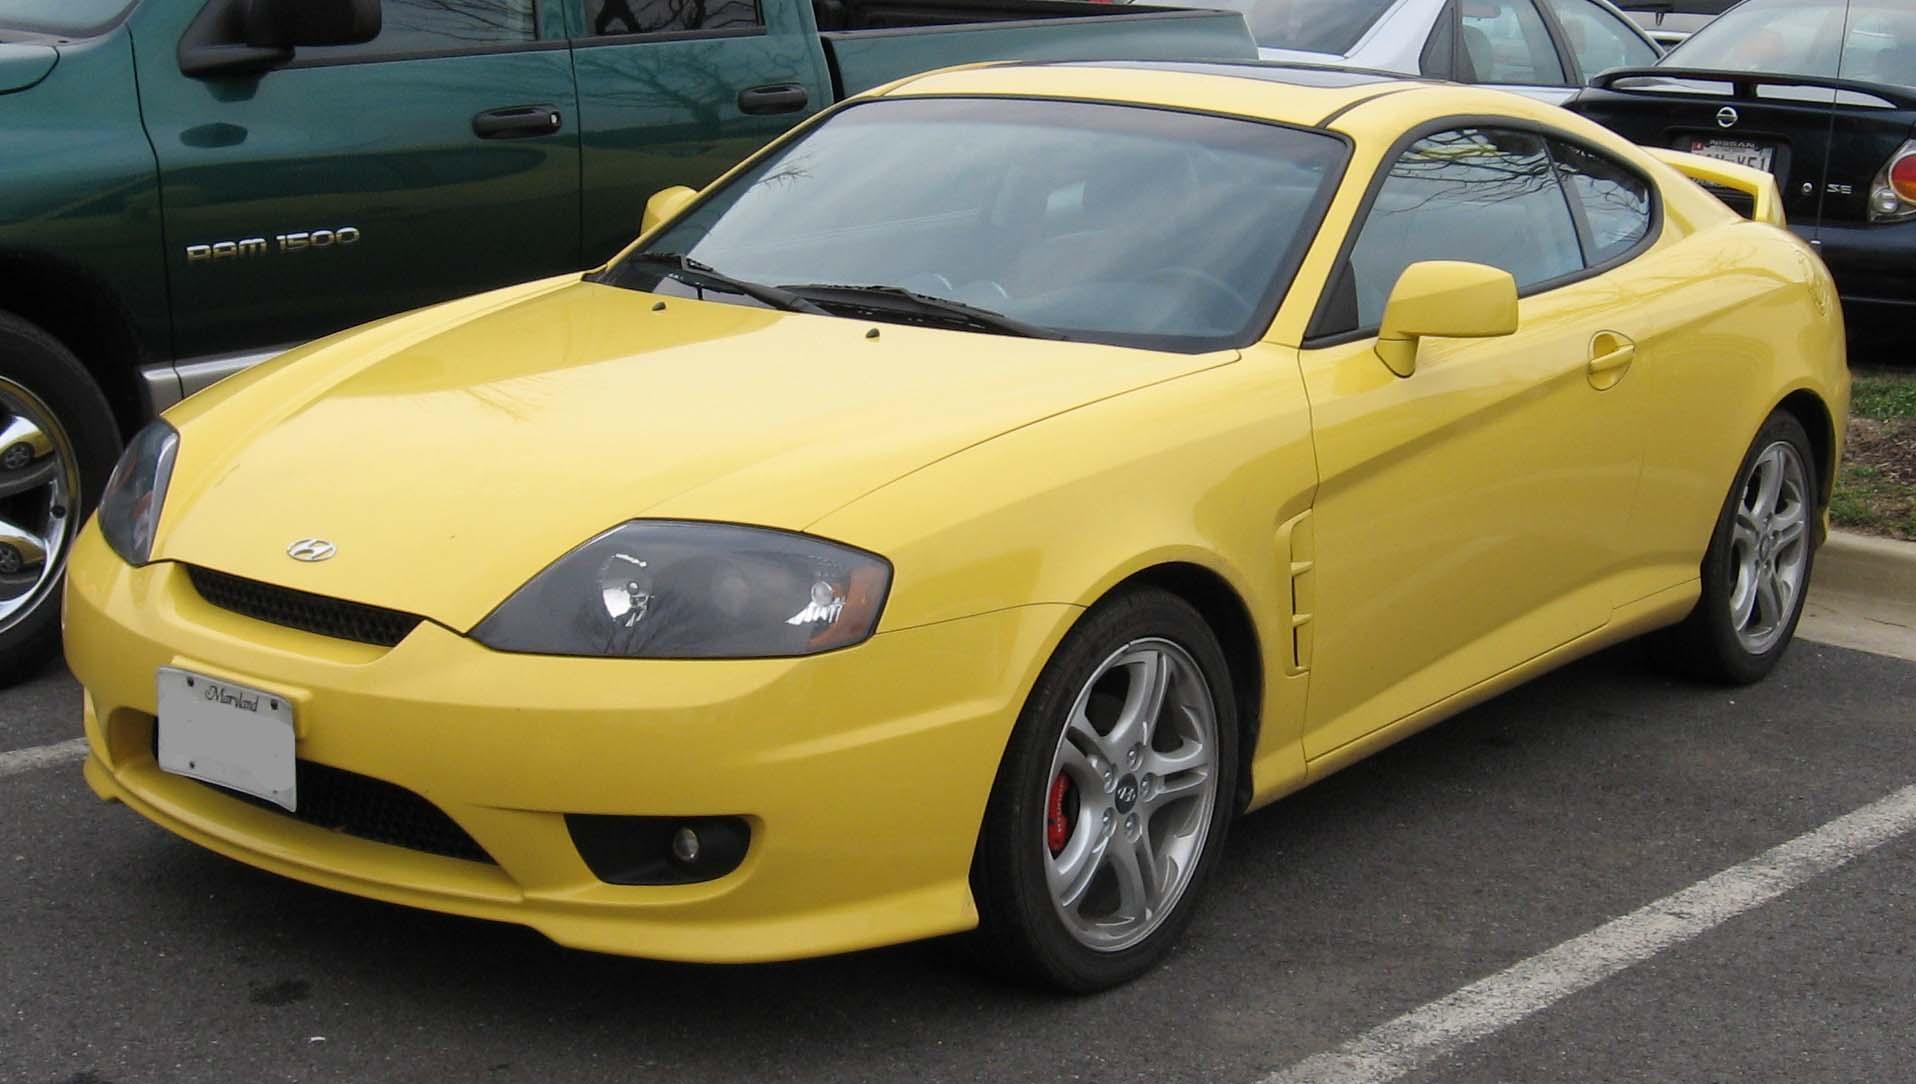 File:2006-Hyundai-Tiburon.jpg - Wikimedia Commons